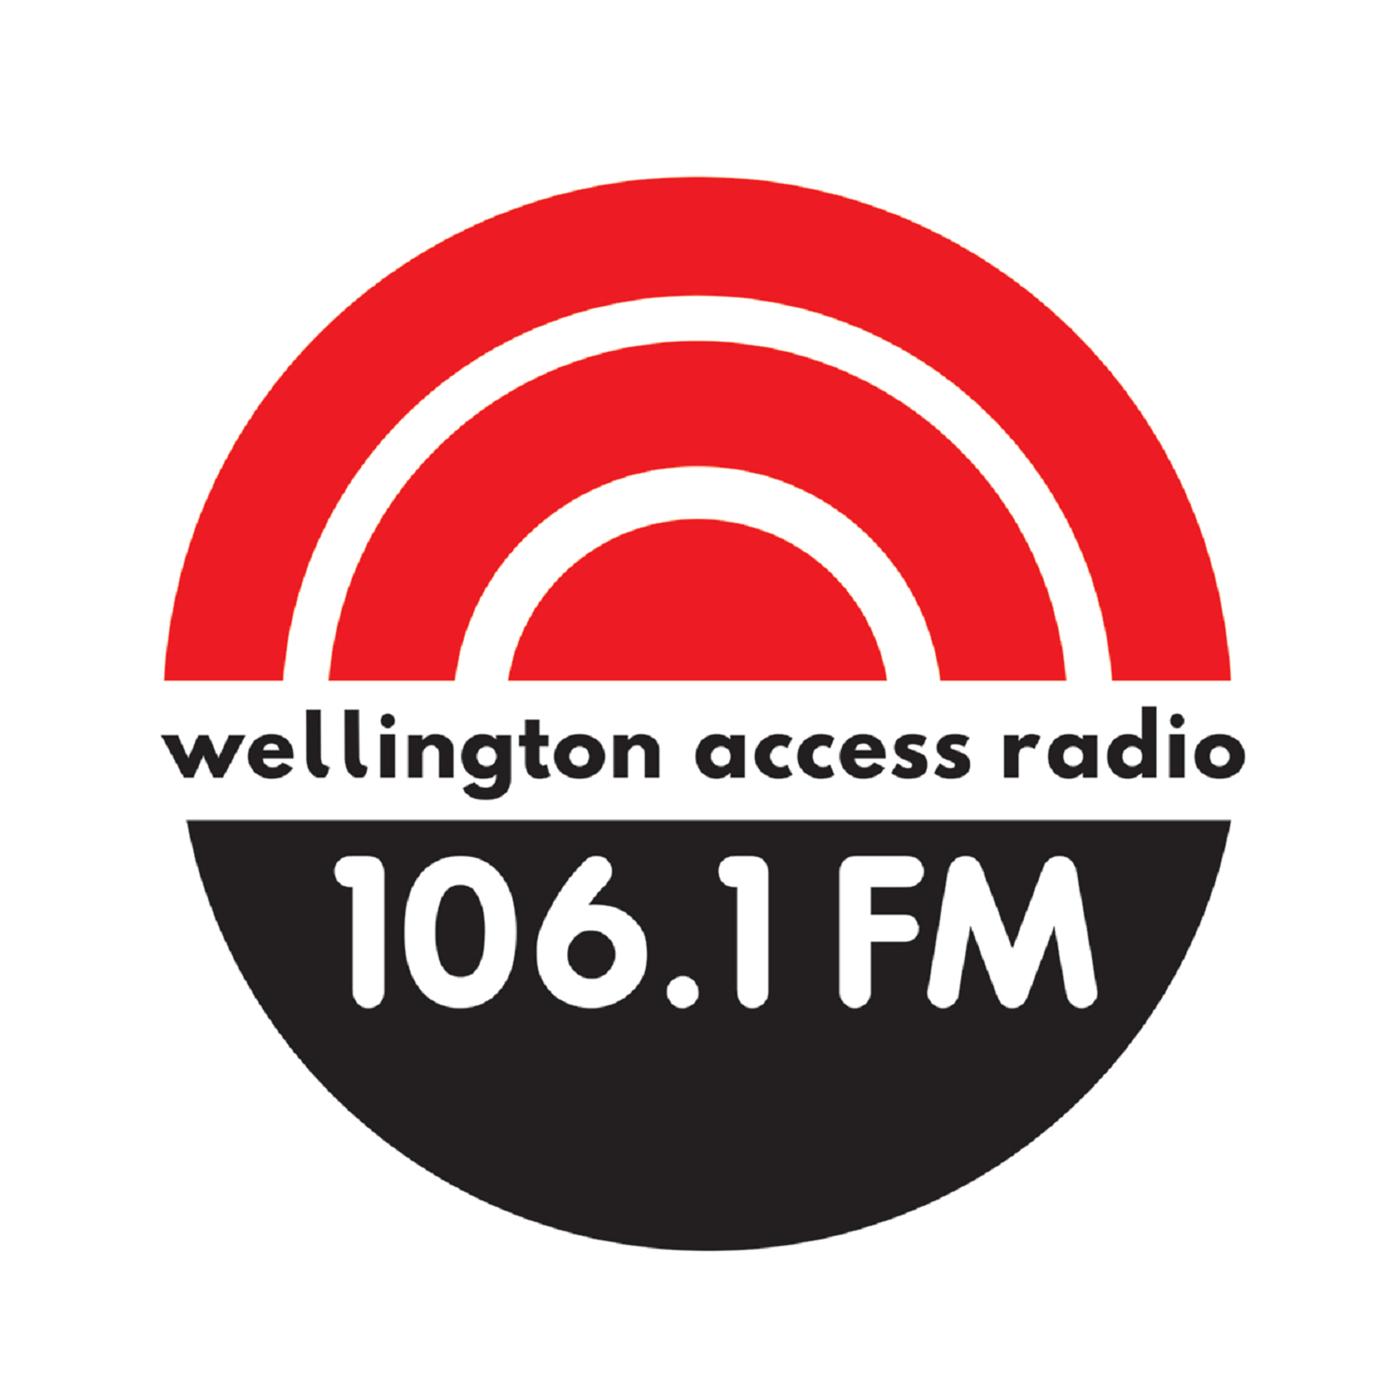 https://cdn.accessradio.org/StationFolder/war/Images/WGTN_Access_Radio_Logo4.png